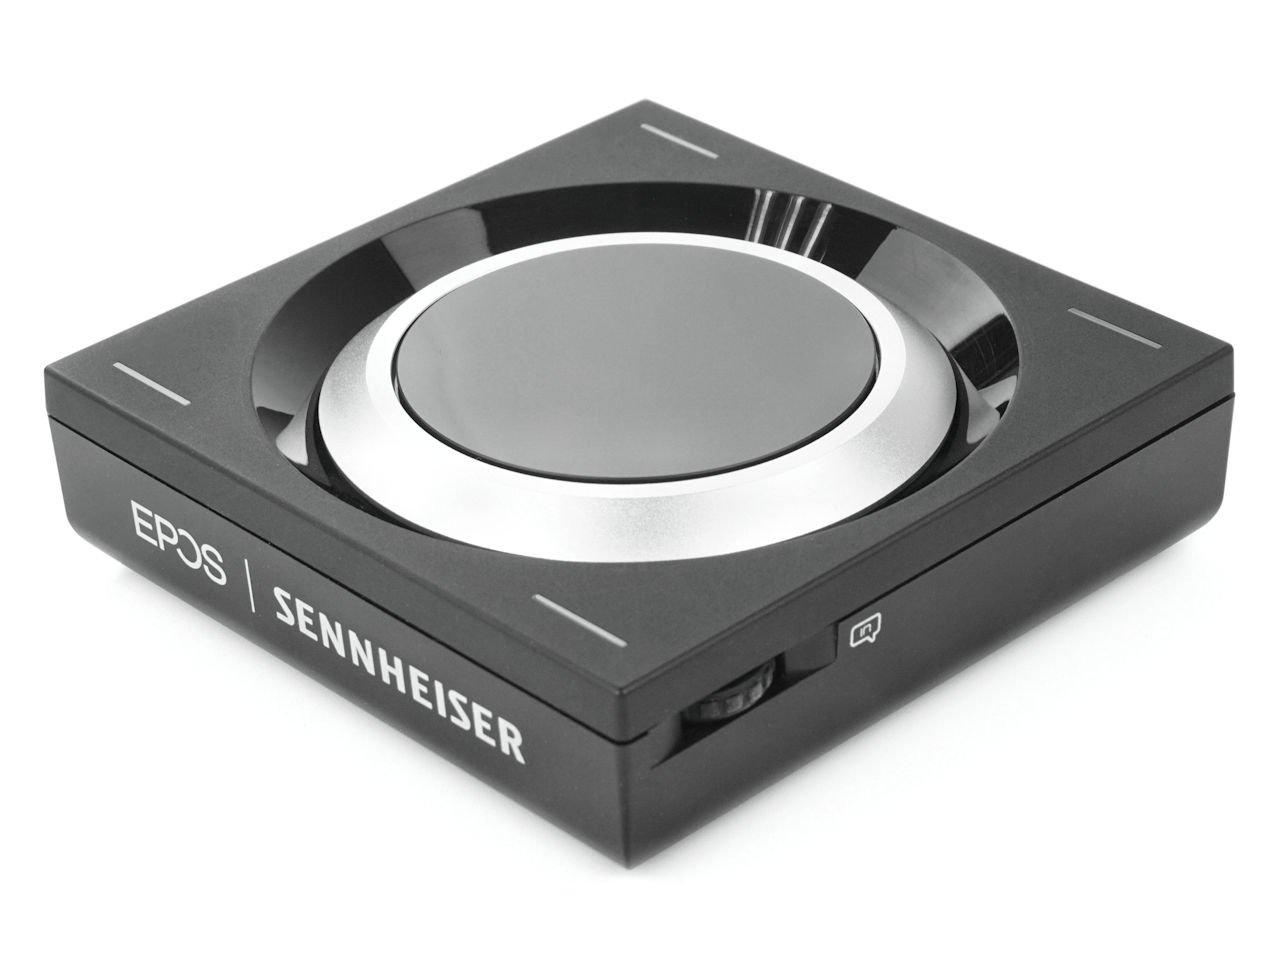 EPOS | Sennheiser GSX 1200 Pro